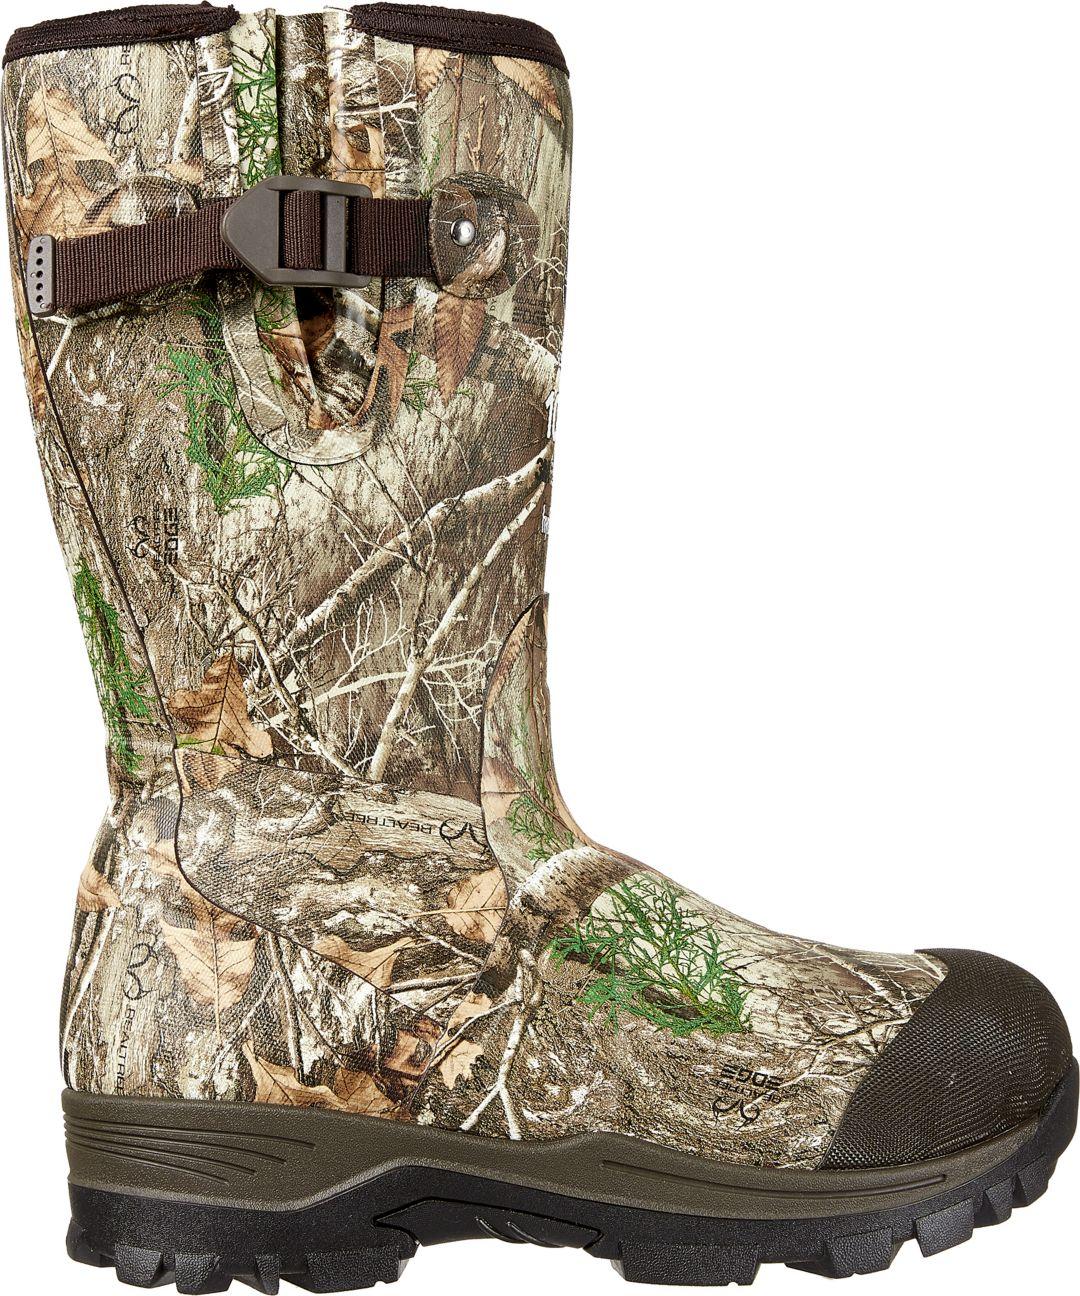 4f8f2d30e51 Field & Stream Women's Swamptracker 1000g RTE Rubber Hunting Boots